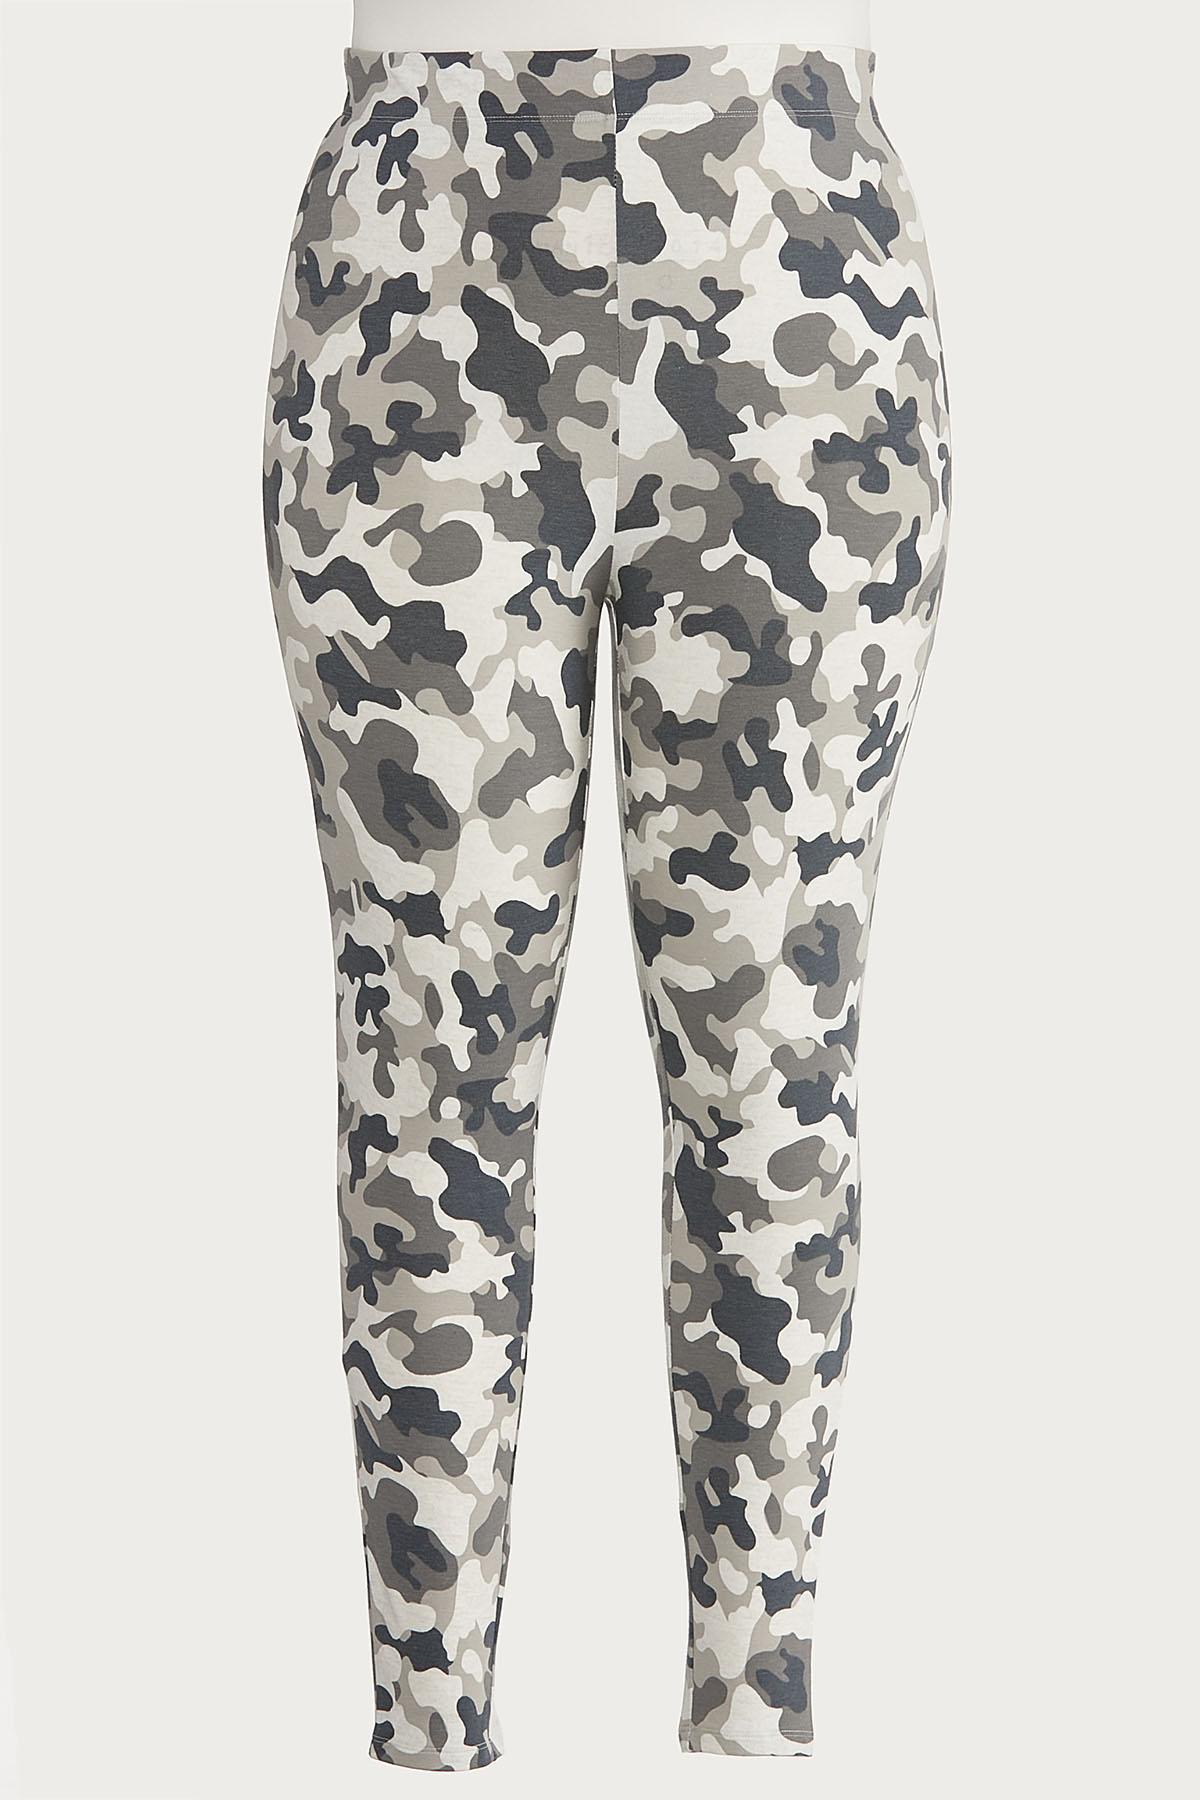 Plus Size Gray Camo Leggings